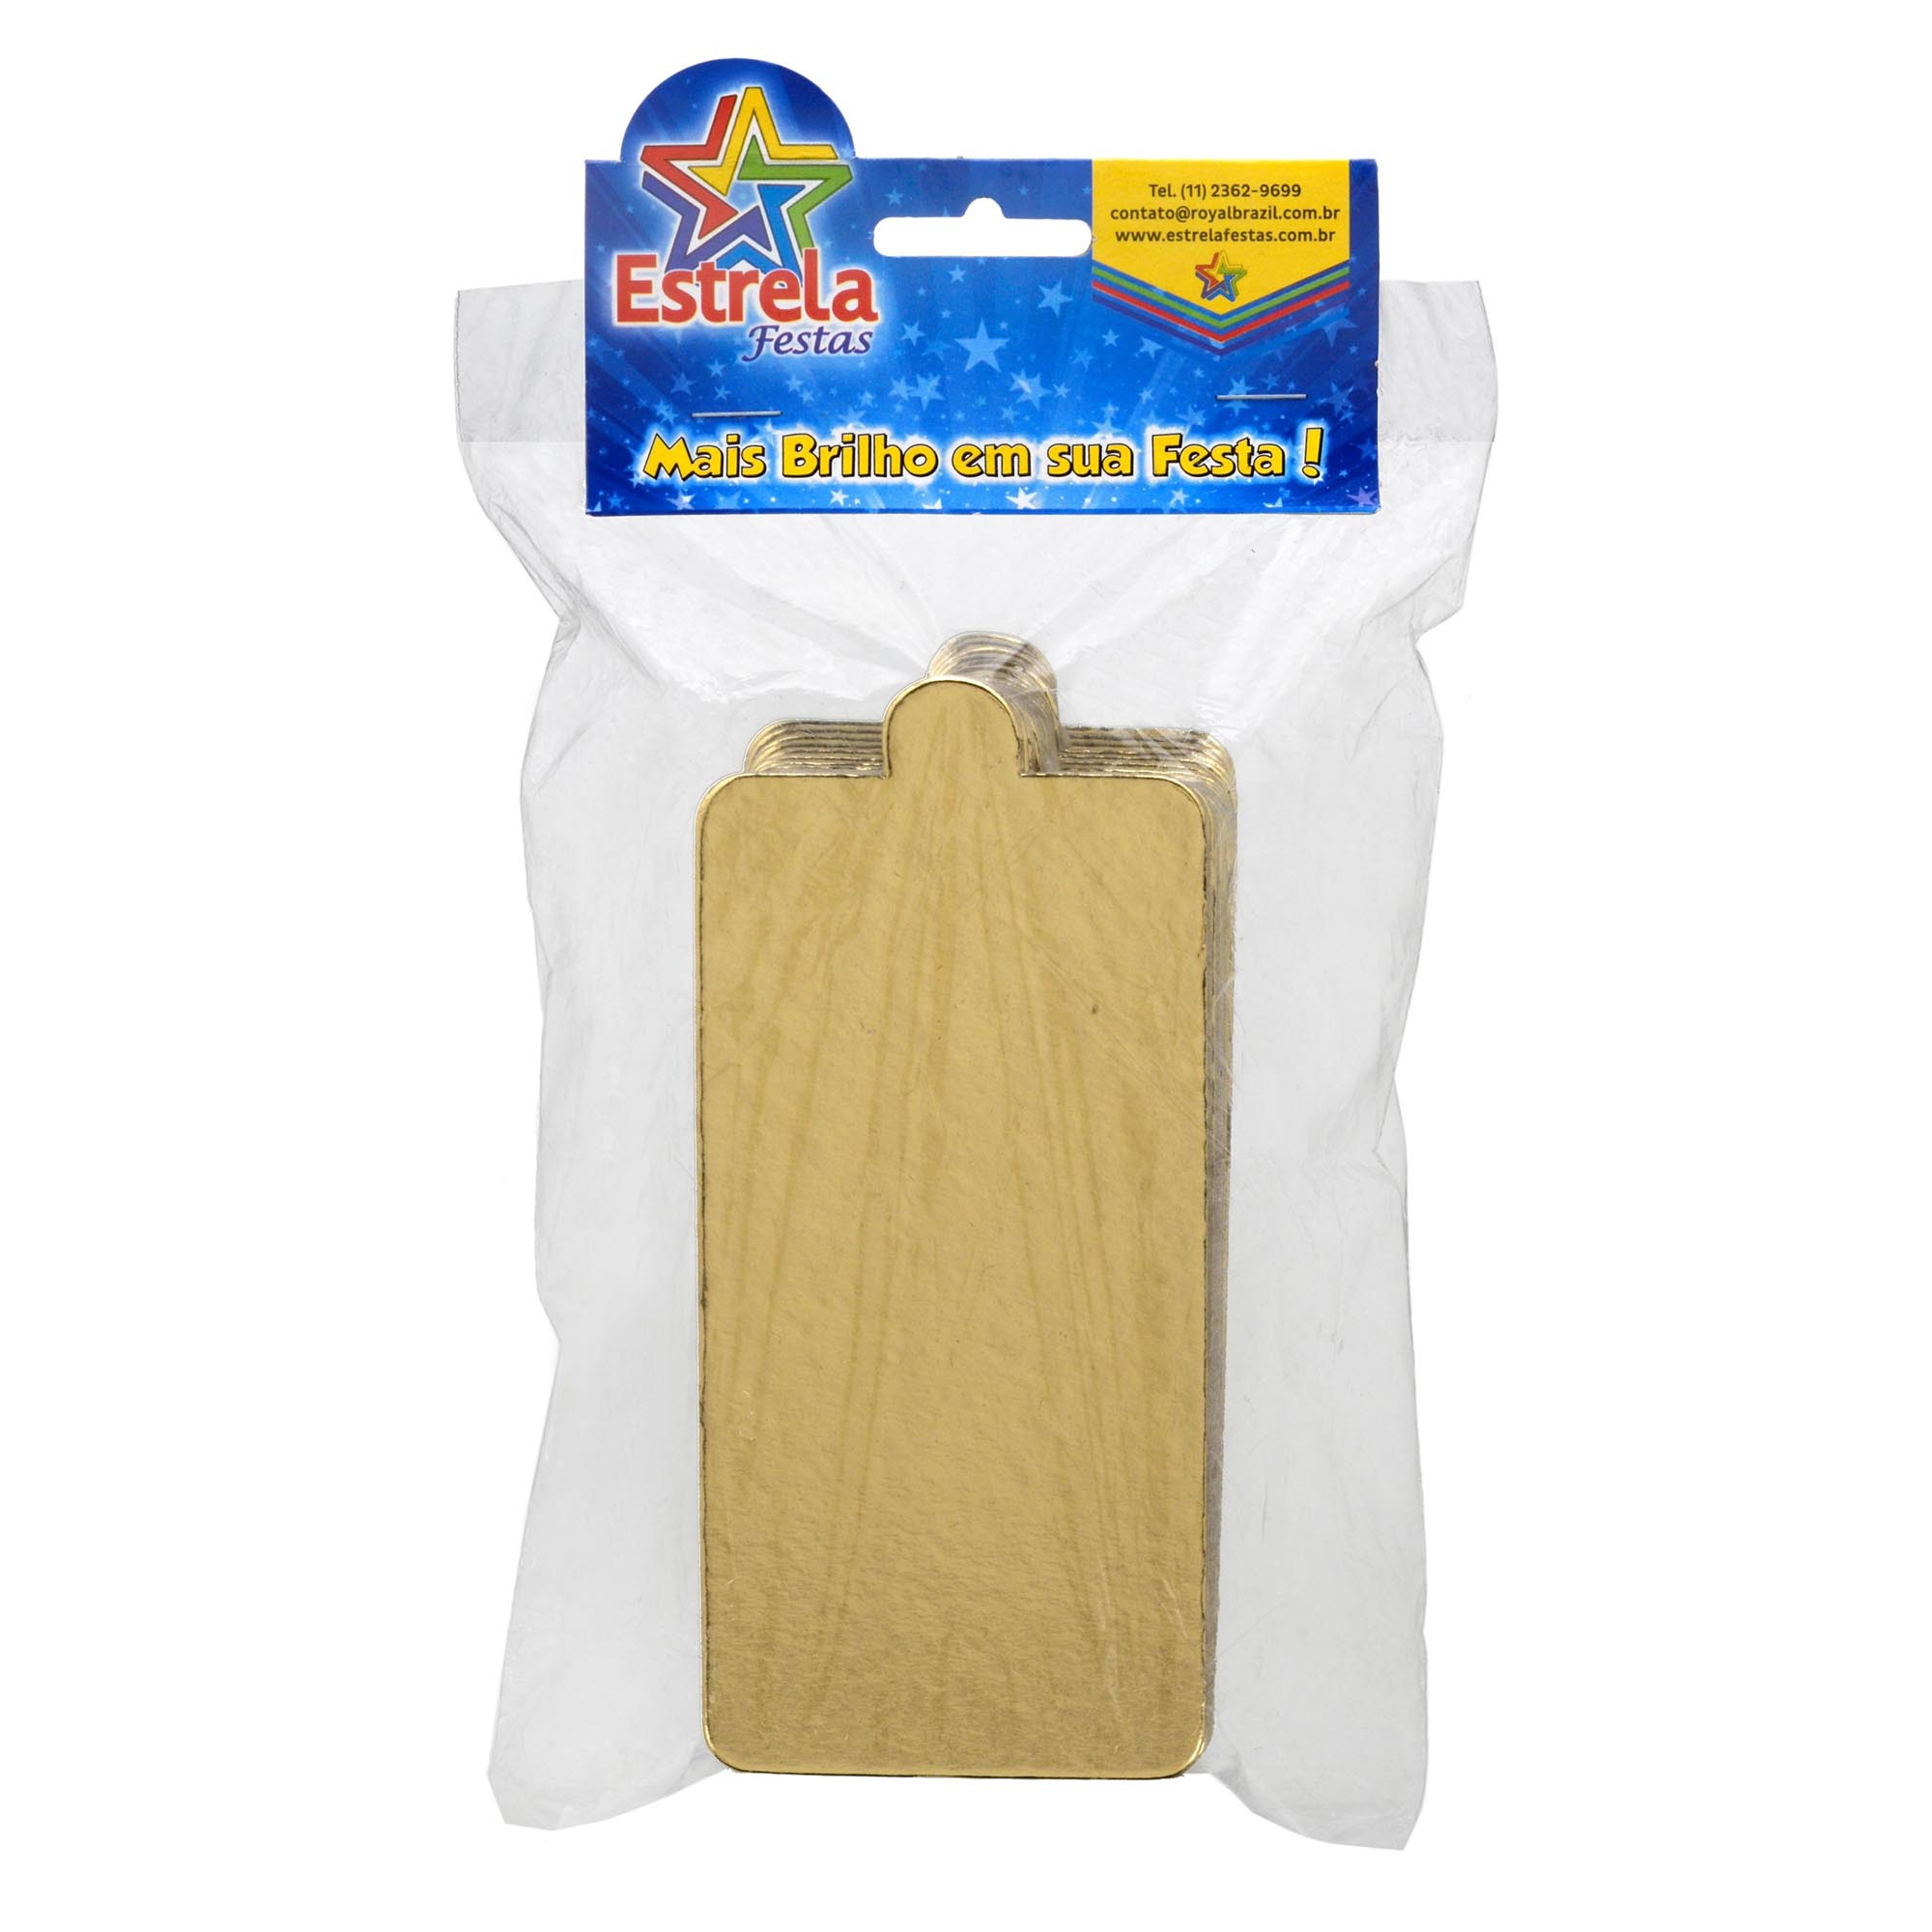 100 Bases Laminadas, Suporte P/ Bomba de Chocolate, Fatia de Bolo e Doces, 14x7 cm - Ouro